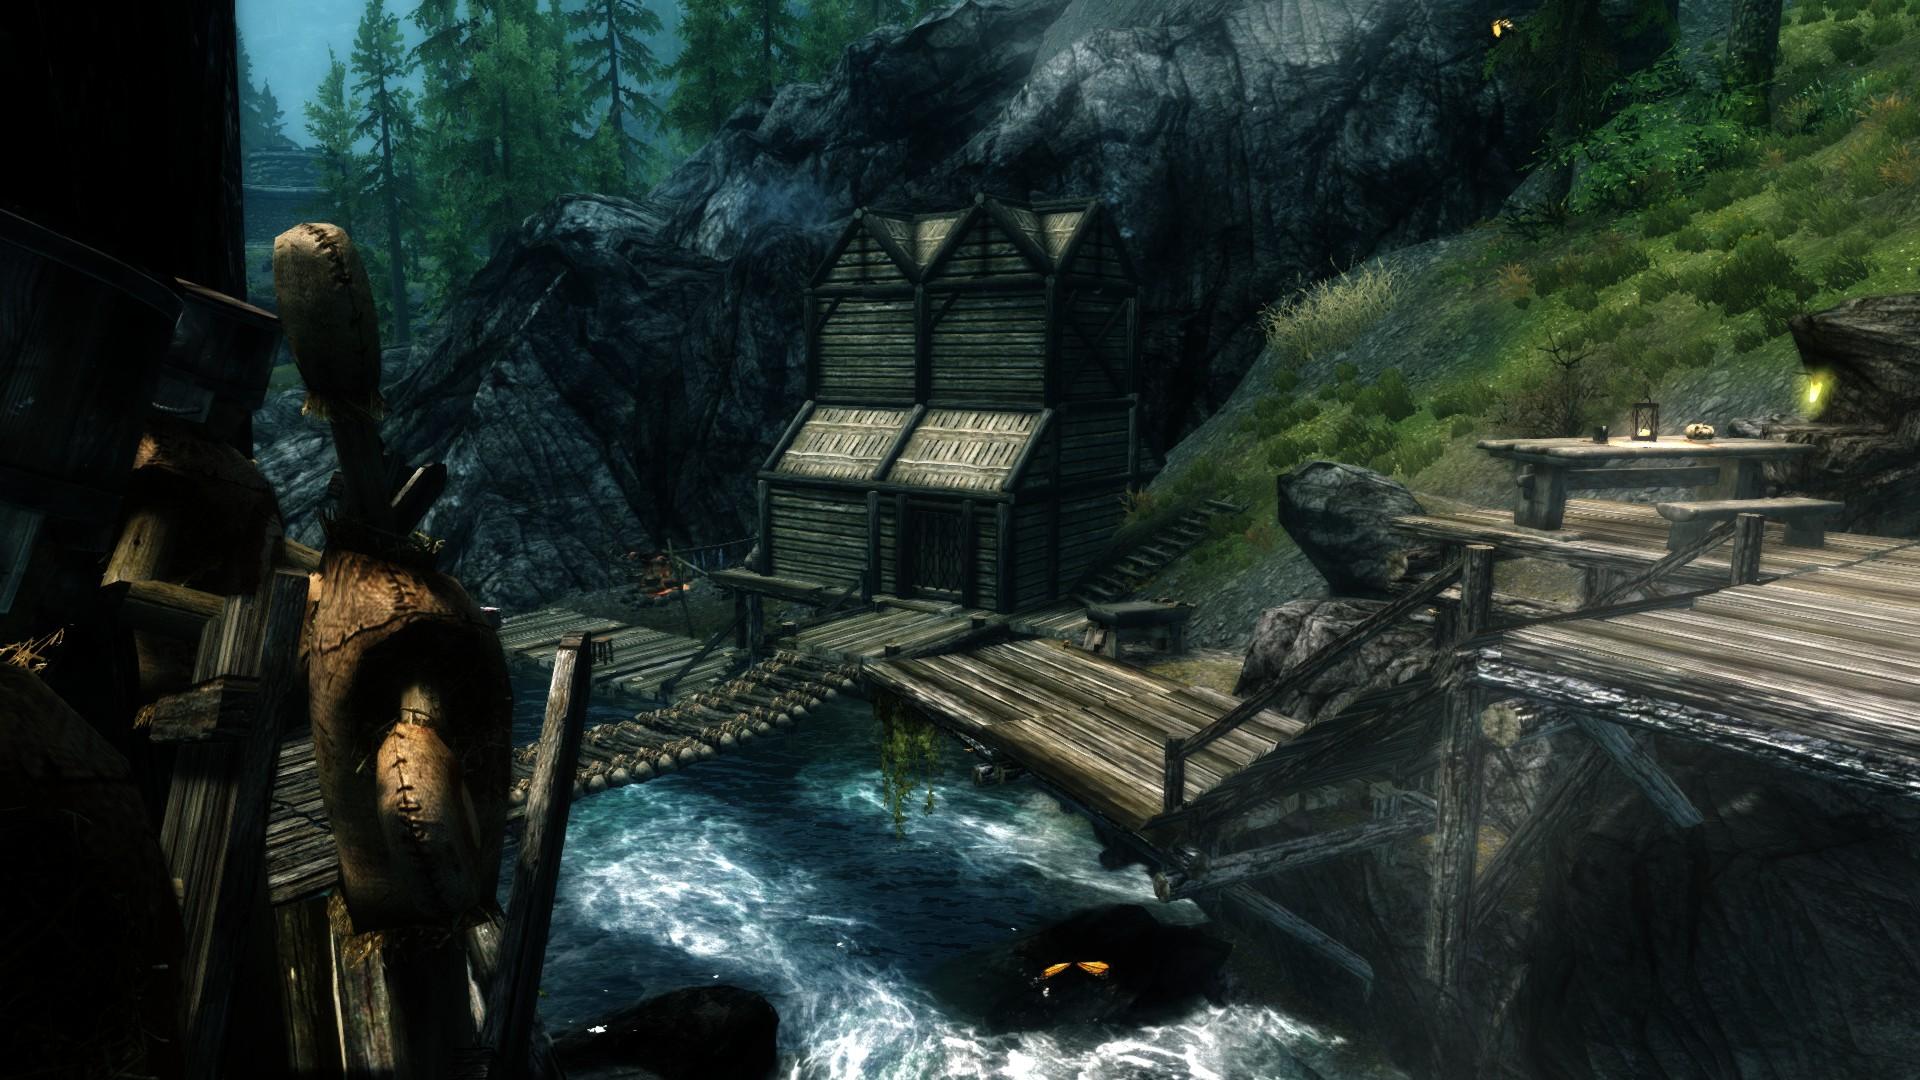 Skyrim Oblivion Morrowind World Of Elder Scrolls